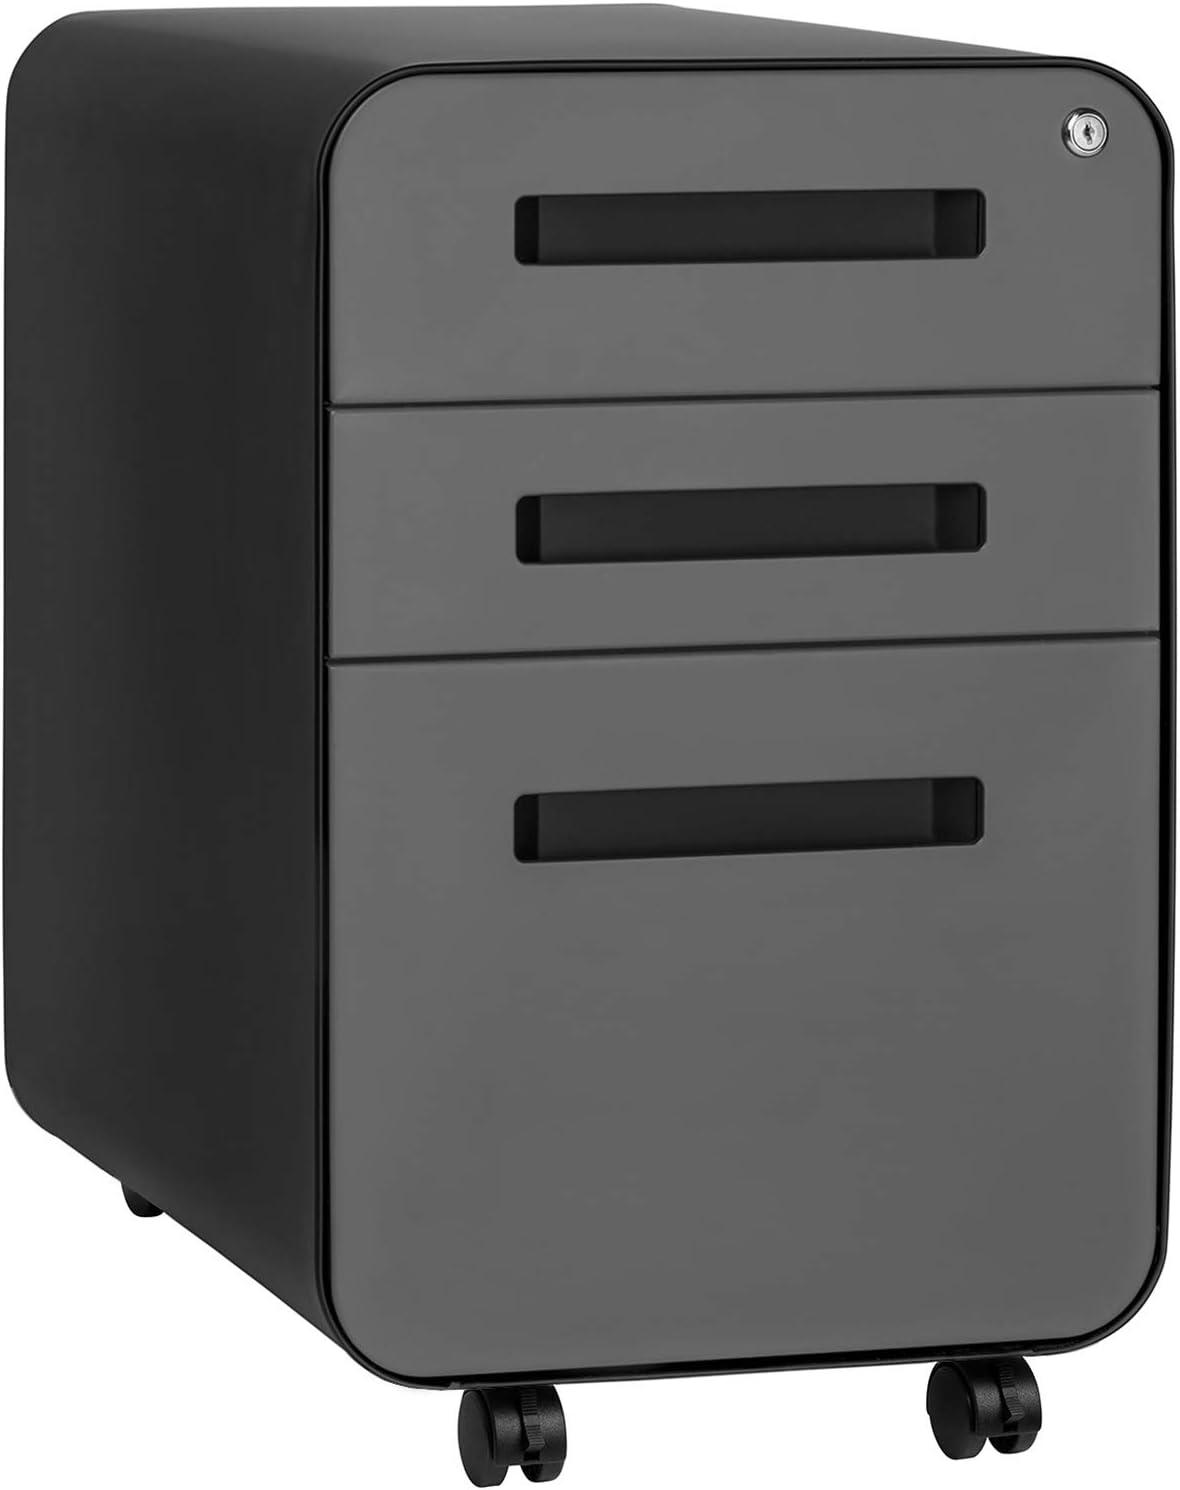 Stockpile 3-Drawer File Cabinet, Commercial-Grade (Black/Grey): Kitchen & Dining